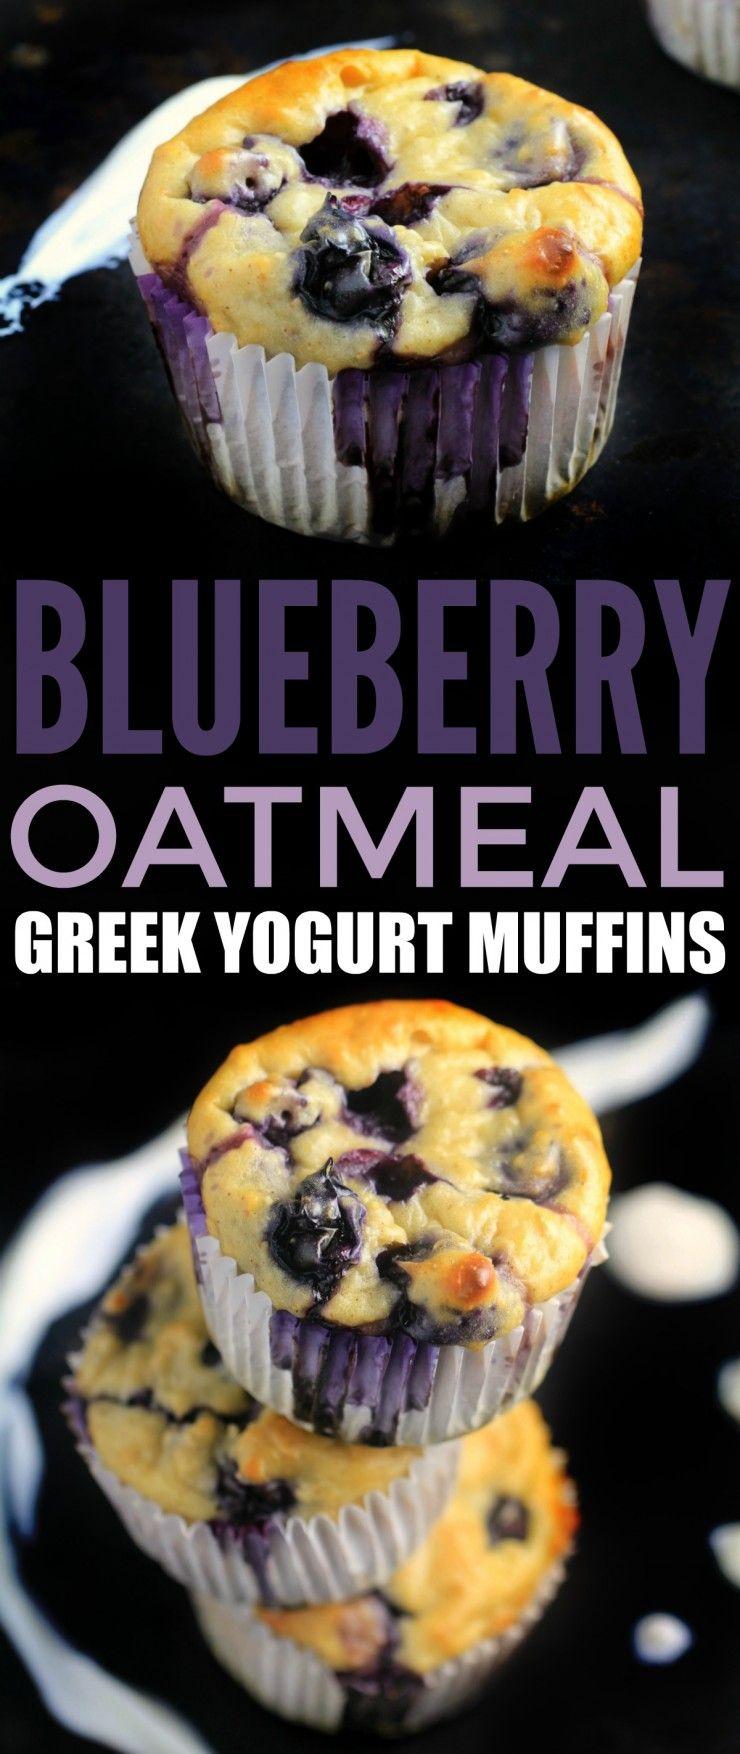 Blueberry Oatmeal Greek Yogurt Muffins Recipe Greek Yogurt